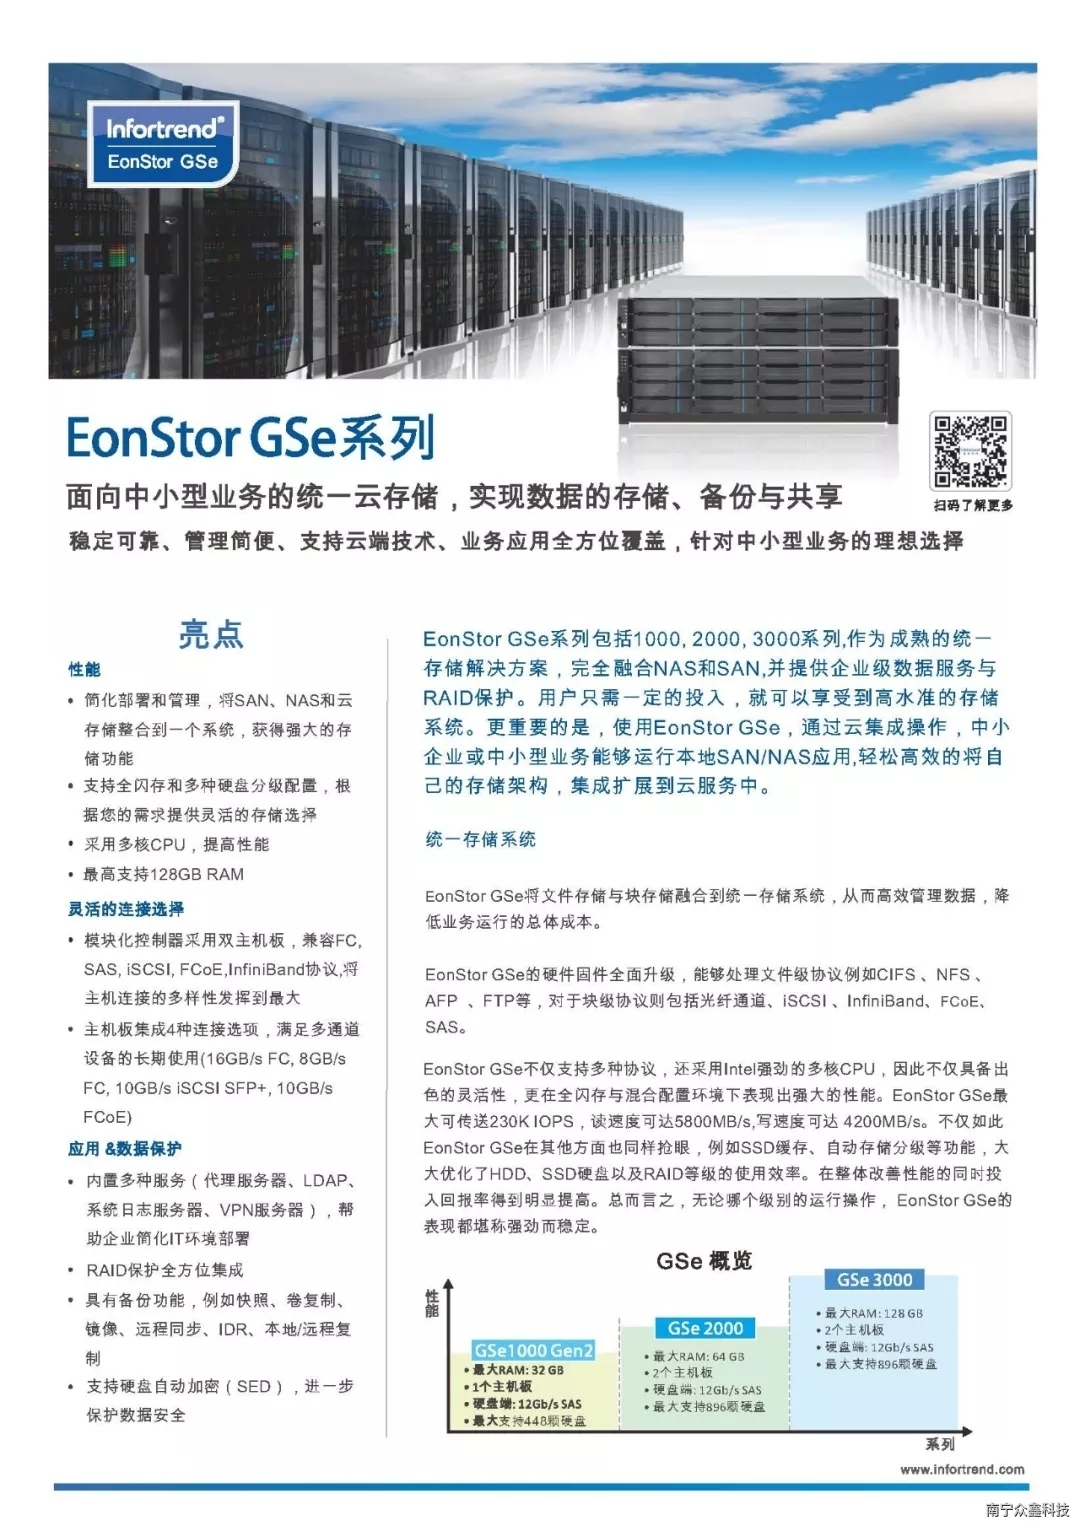 Infortrend普安存儲EonStor GSe